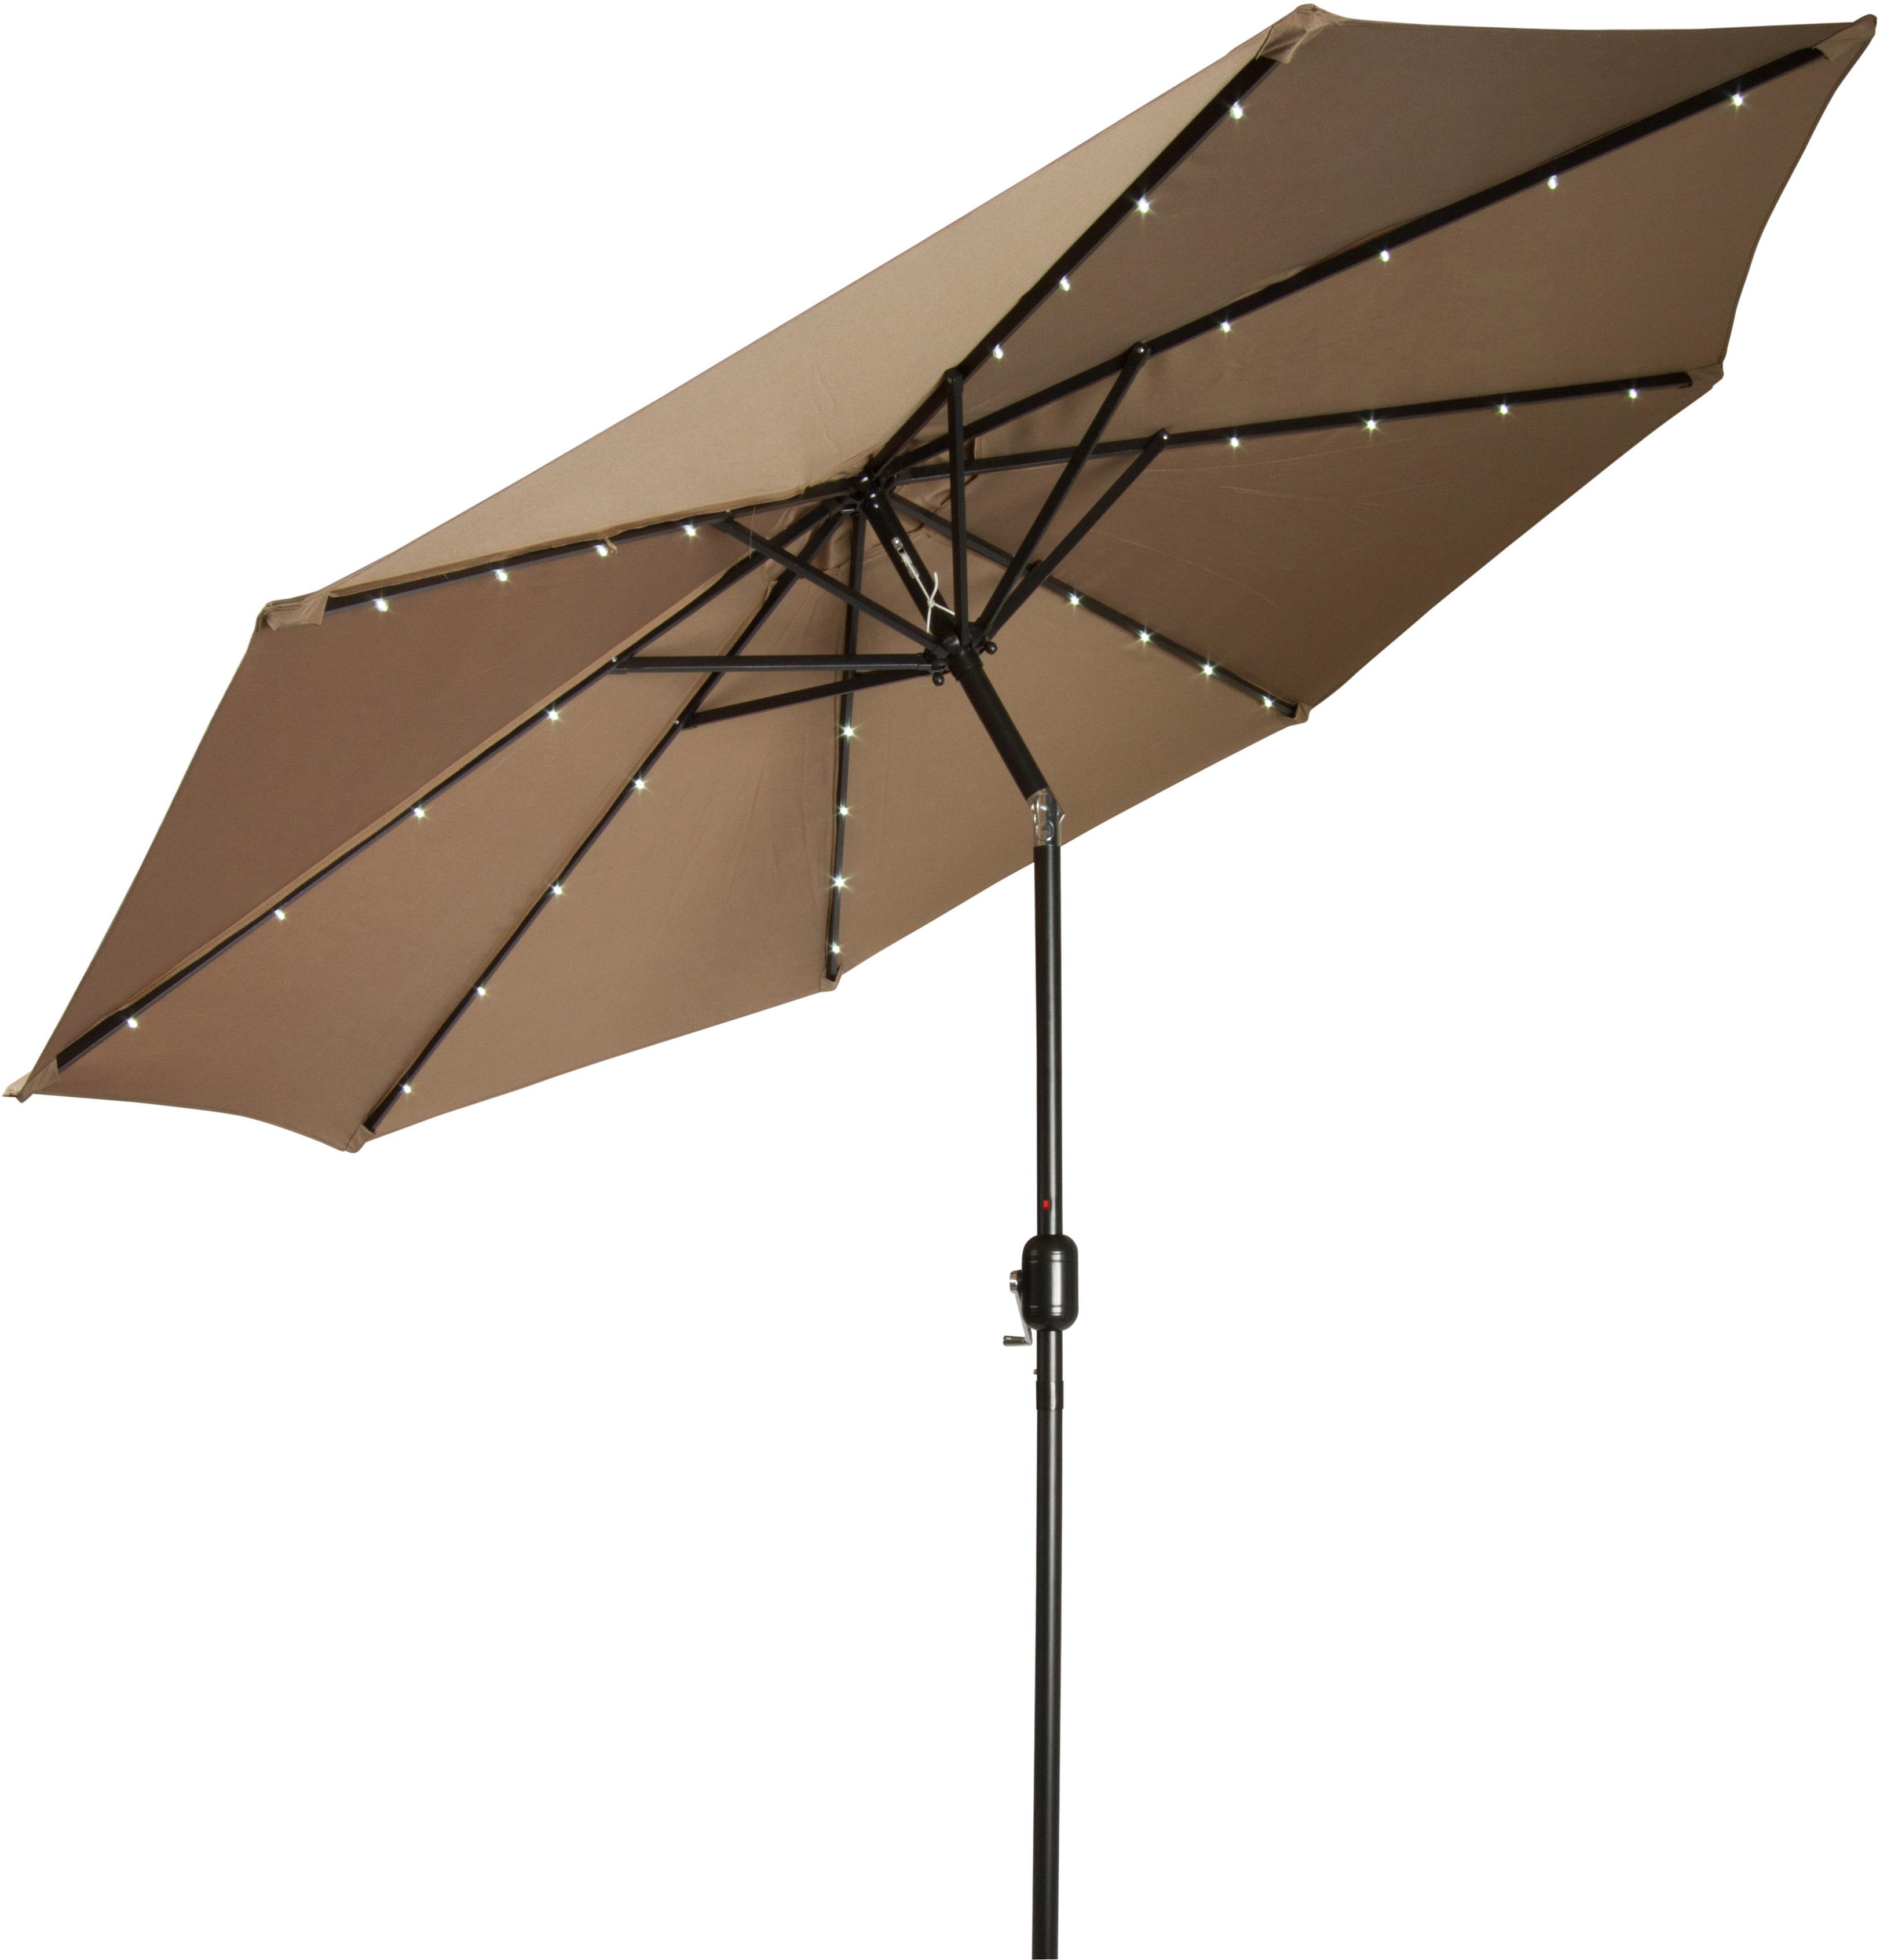 Woll 9' Lighted Market Umbrella Regarding Widely Used Woll Lighted Market Umbrellas (View 13 of 20)